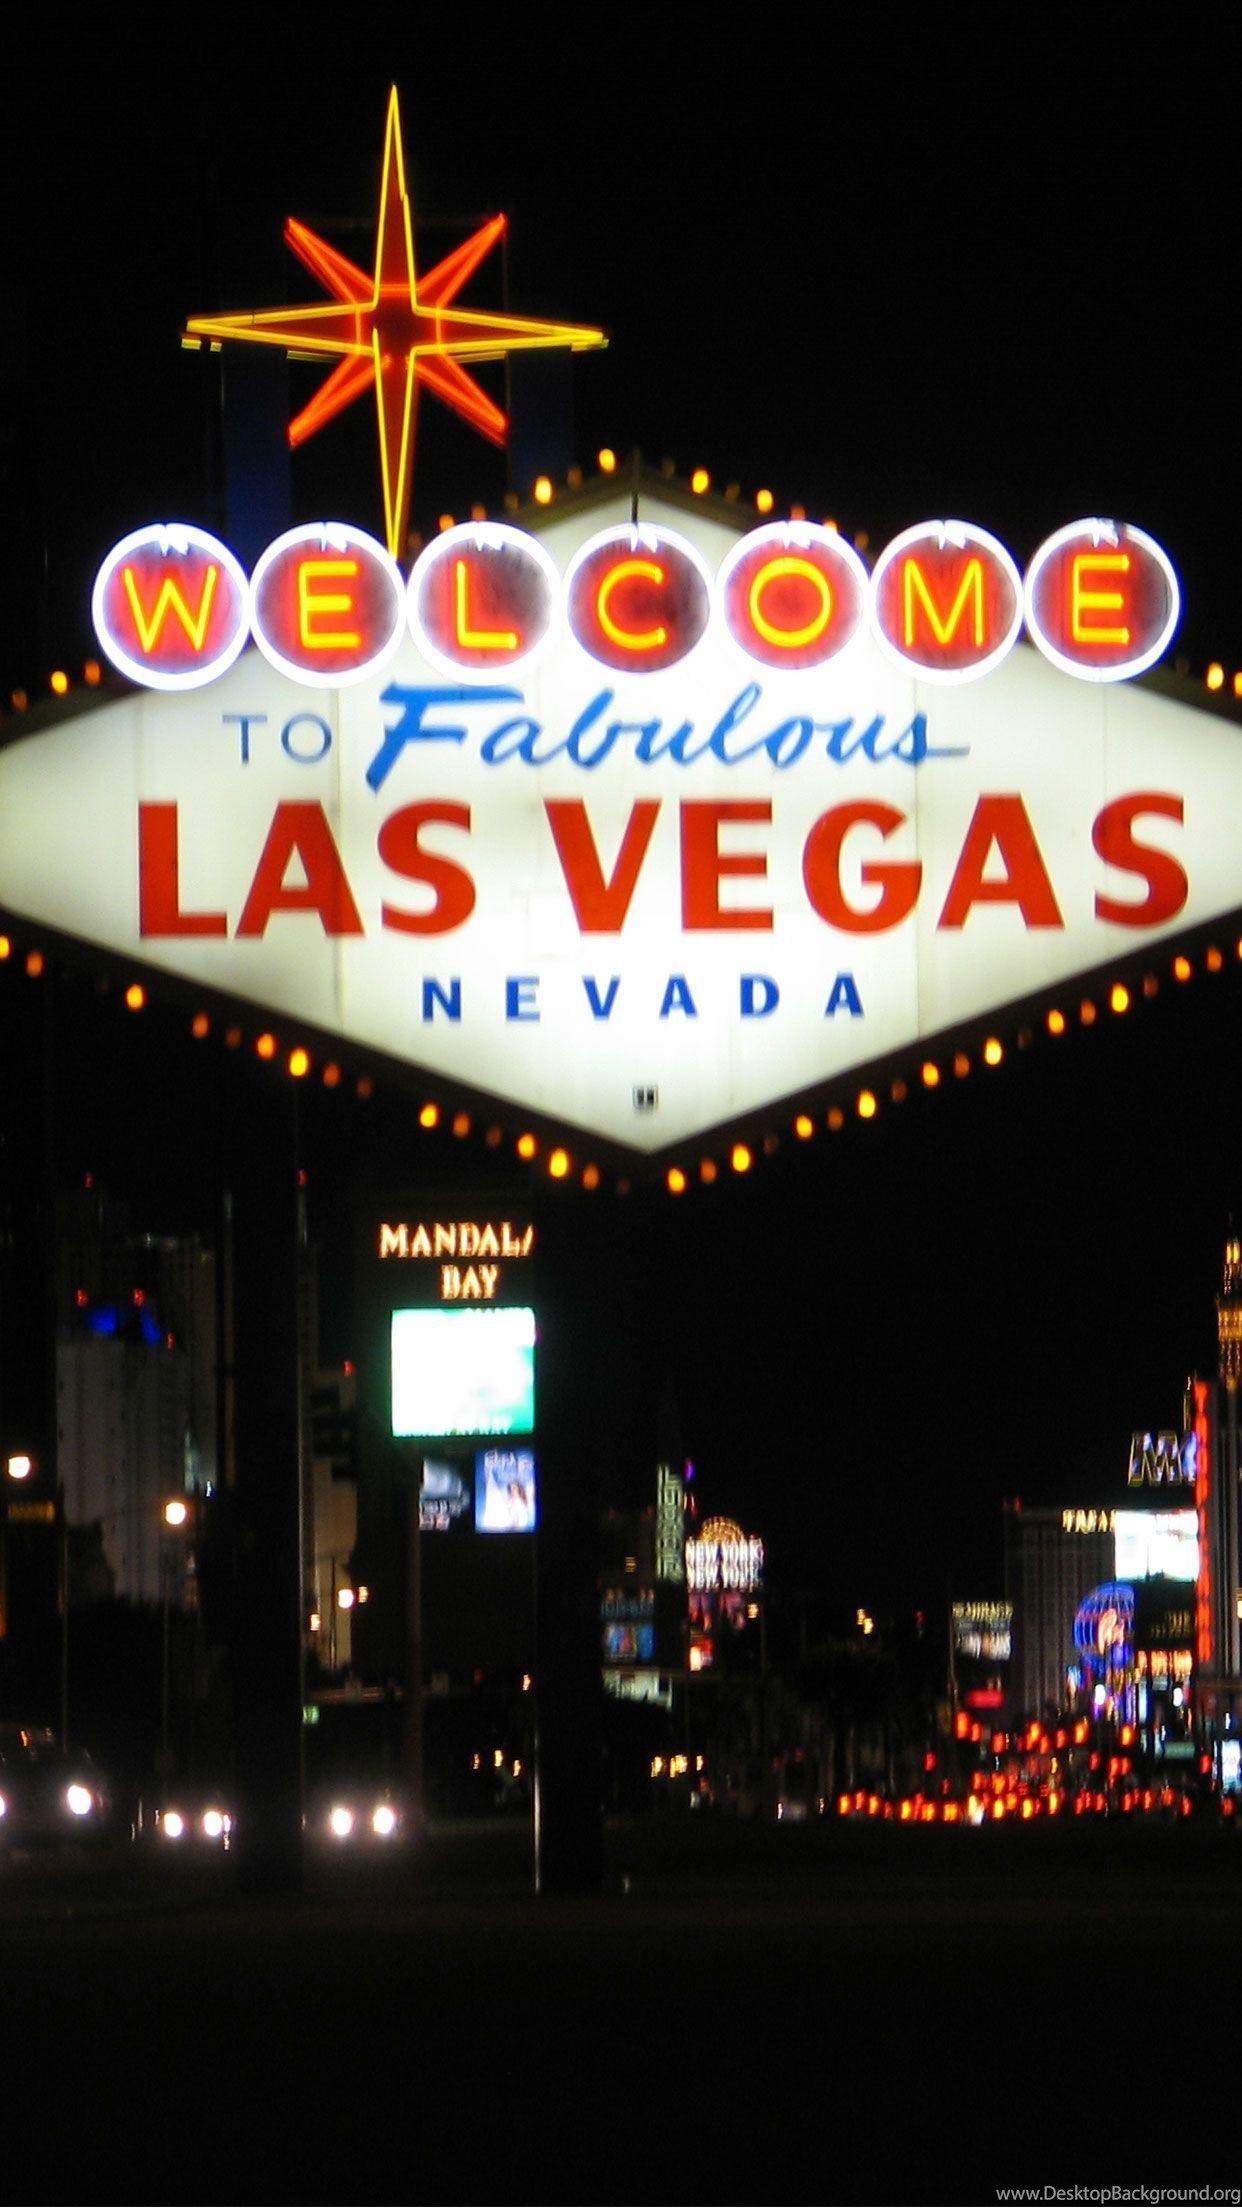 Las Vegas Iphone Wallpapers Top Free Las Vegas Iphone Backgrounds Wallpaperaccess Casino Party Foods Casino Party Decorations Casino Decorations